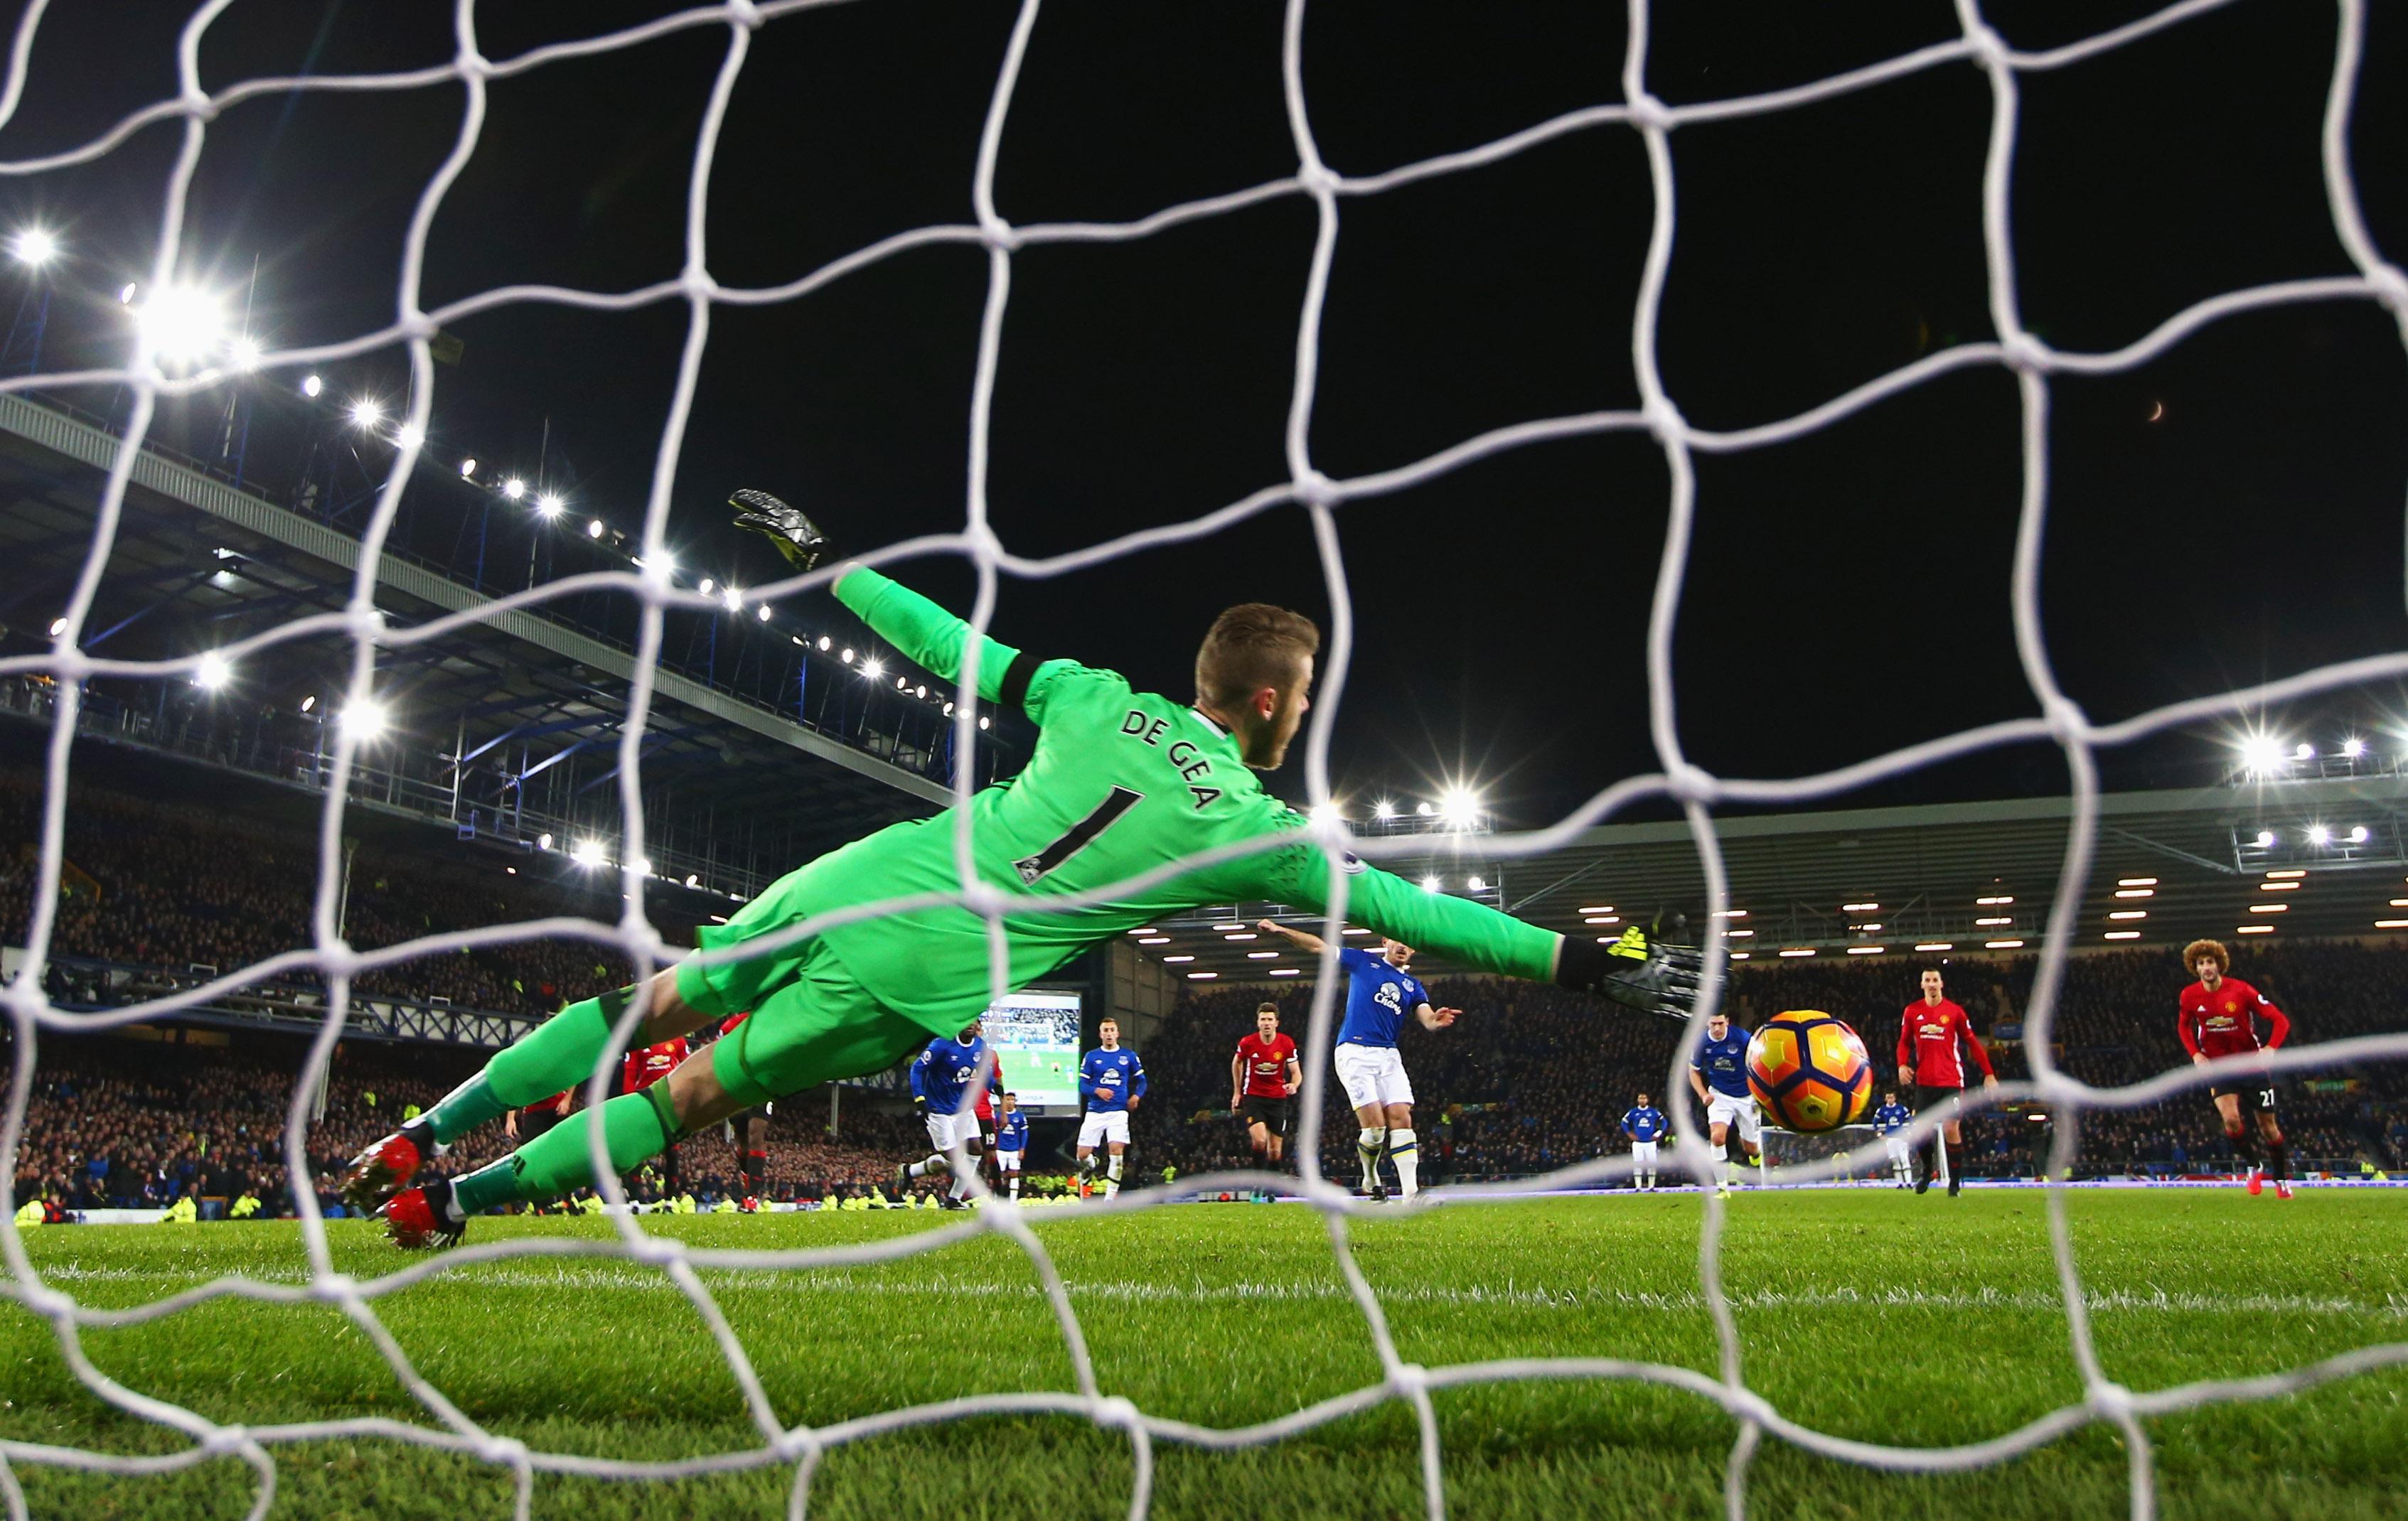 Leighton Baines scoring Everton's equalizer at Goodison Park